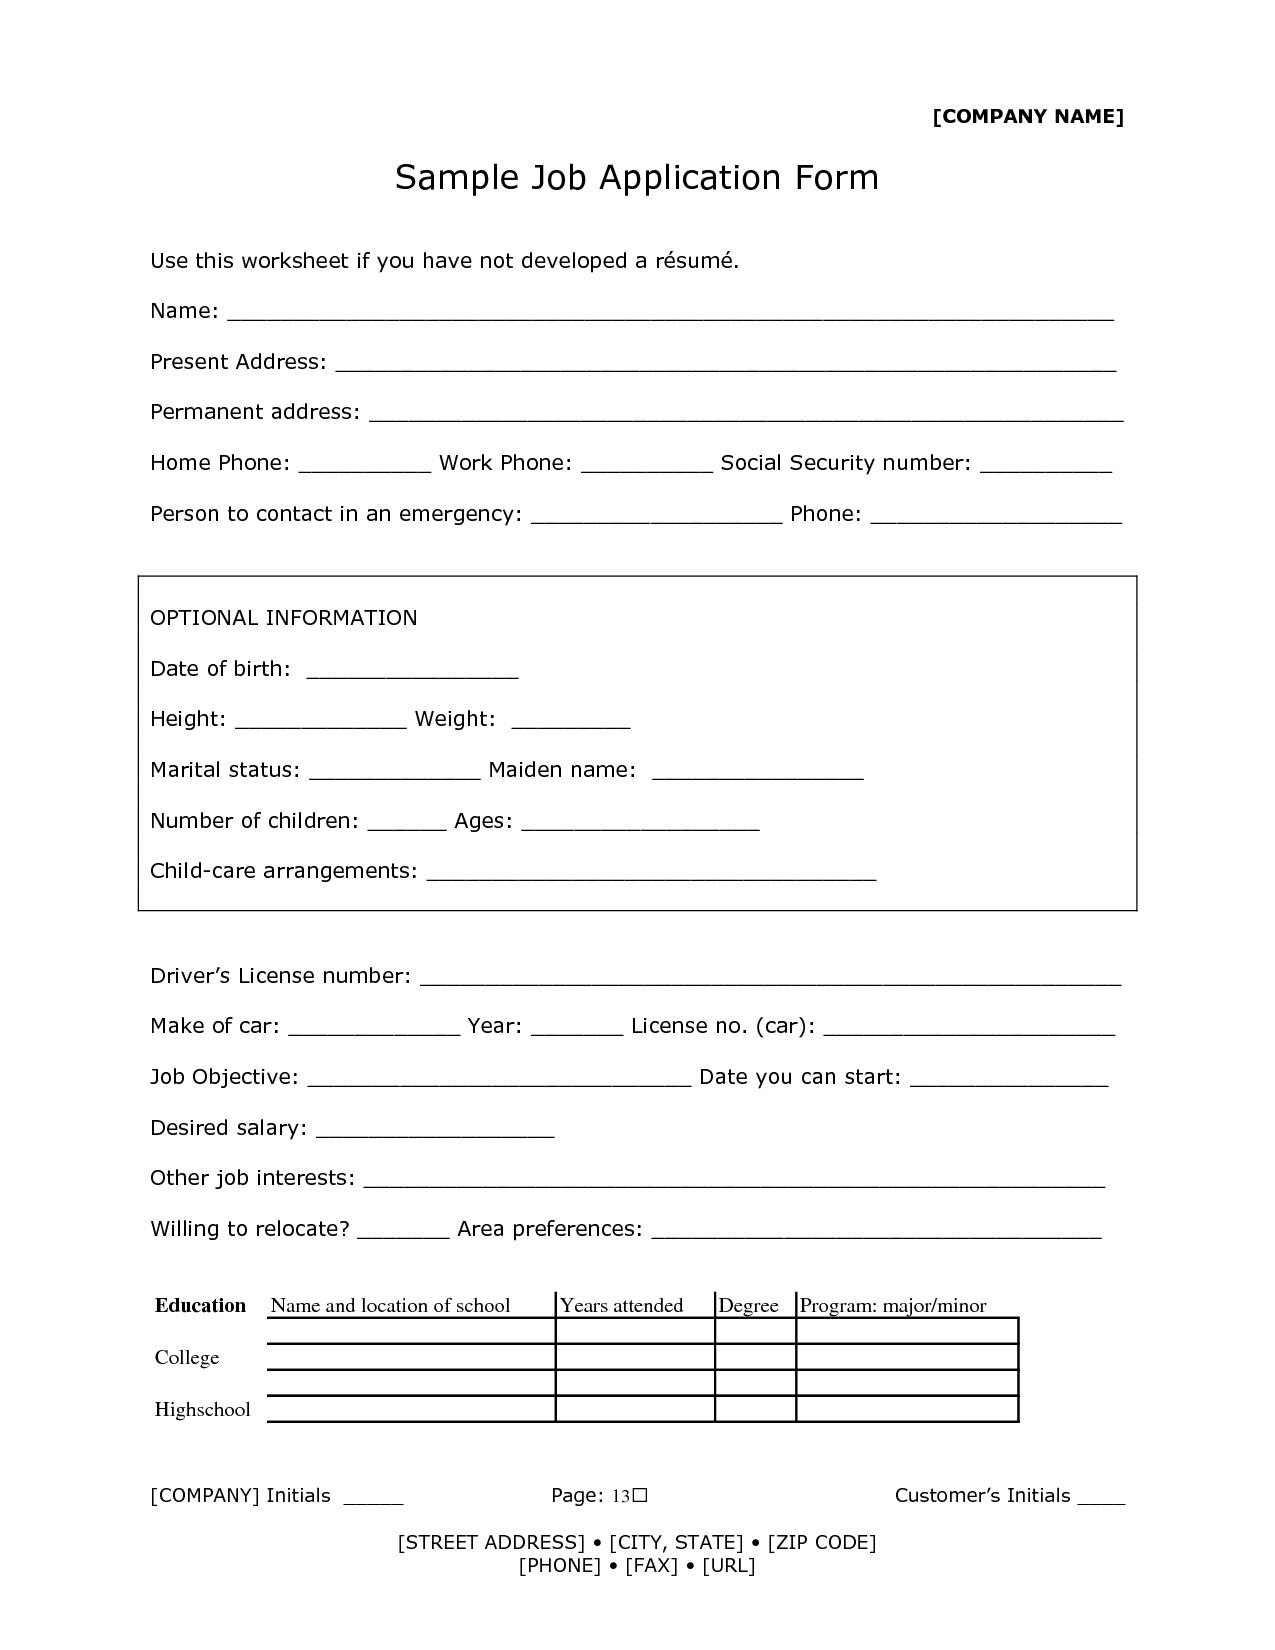 Sample Of Job Application Form Fa09ivho 13 Sample Of Job